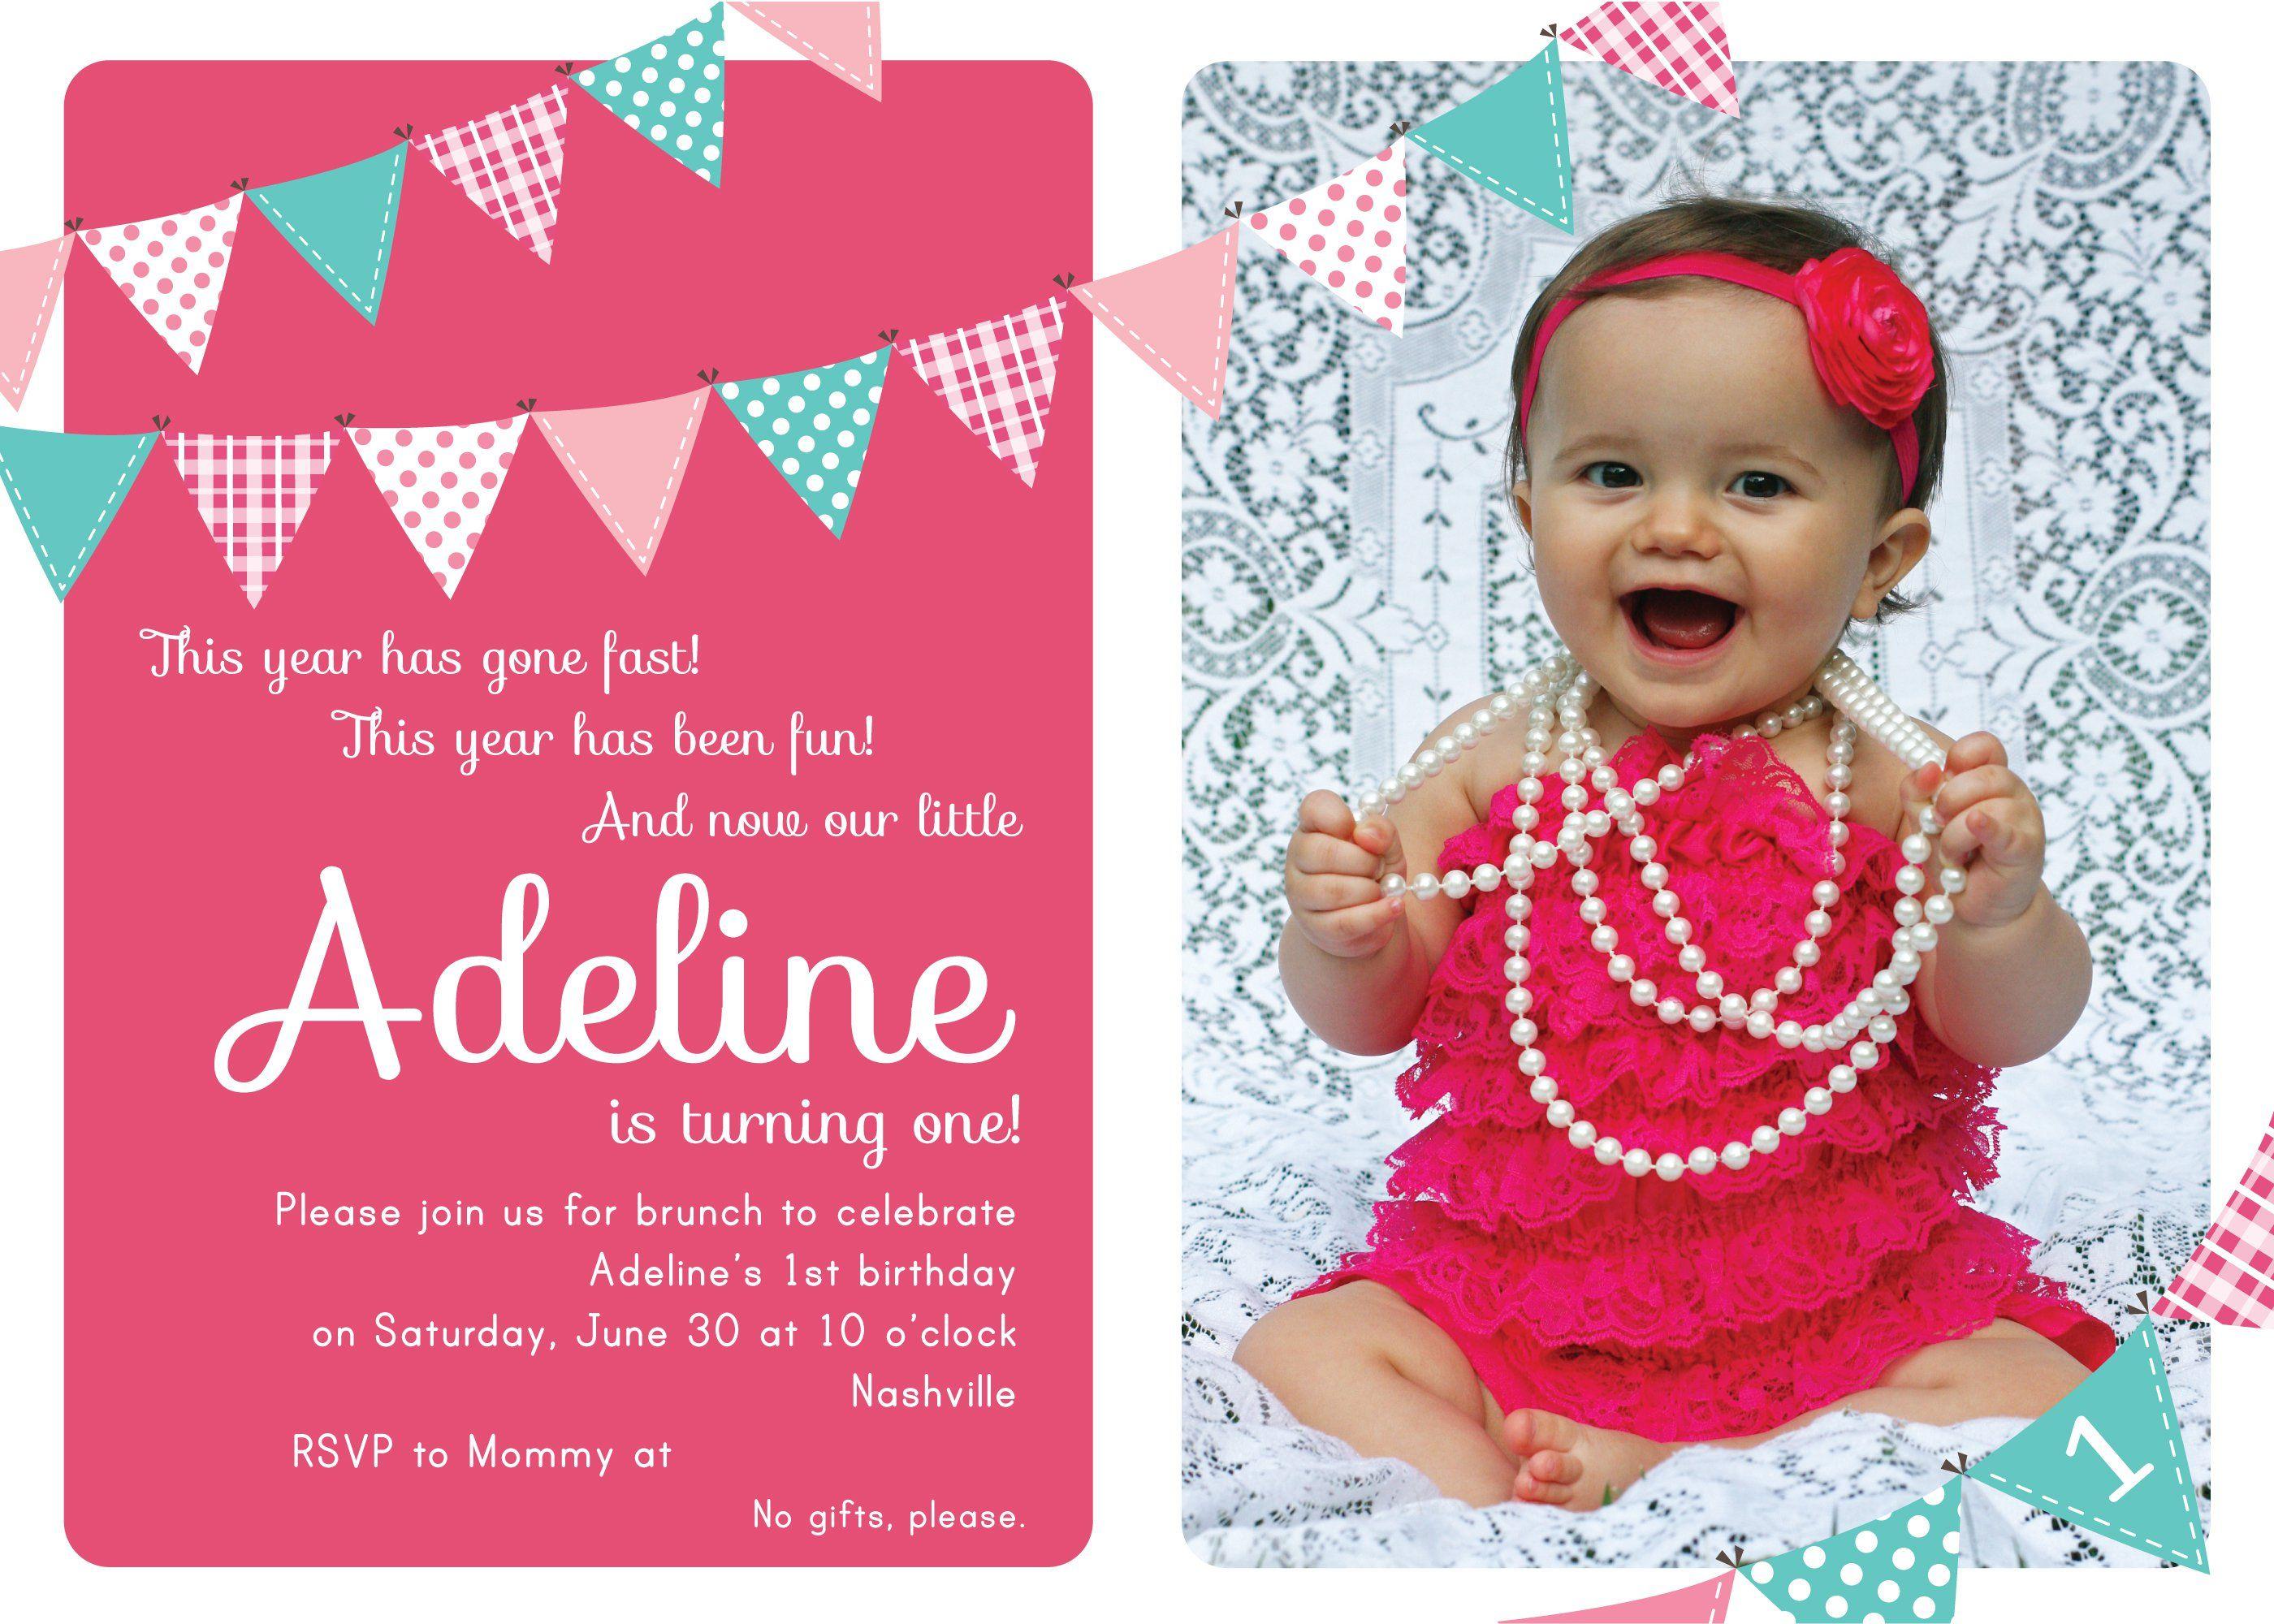 Stupendous 1St Birthday Invitations Birthday Invitation Card Template Funny Birthday Cards Online Fluifree Goldxyz